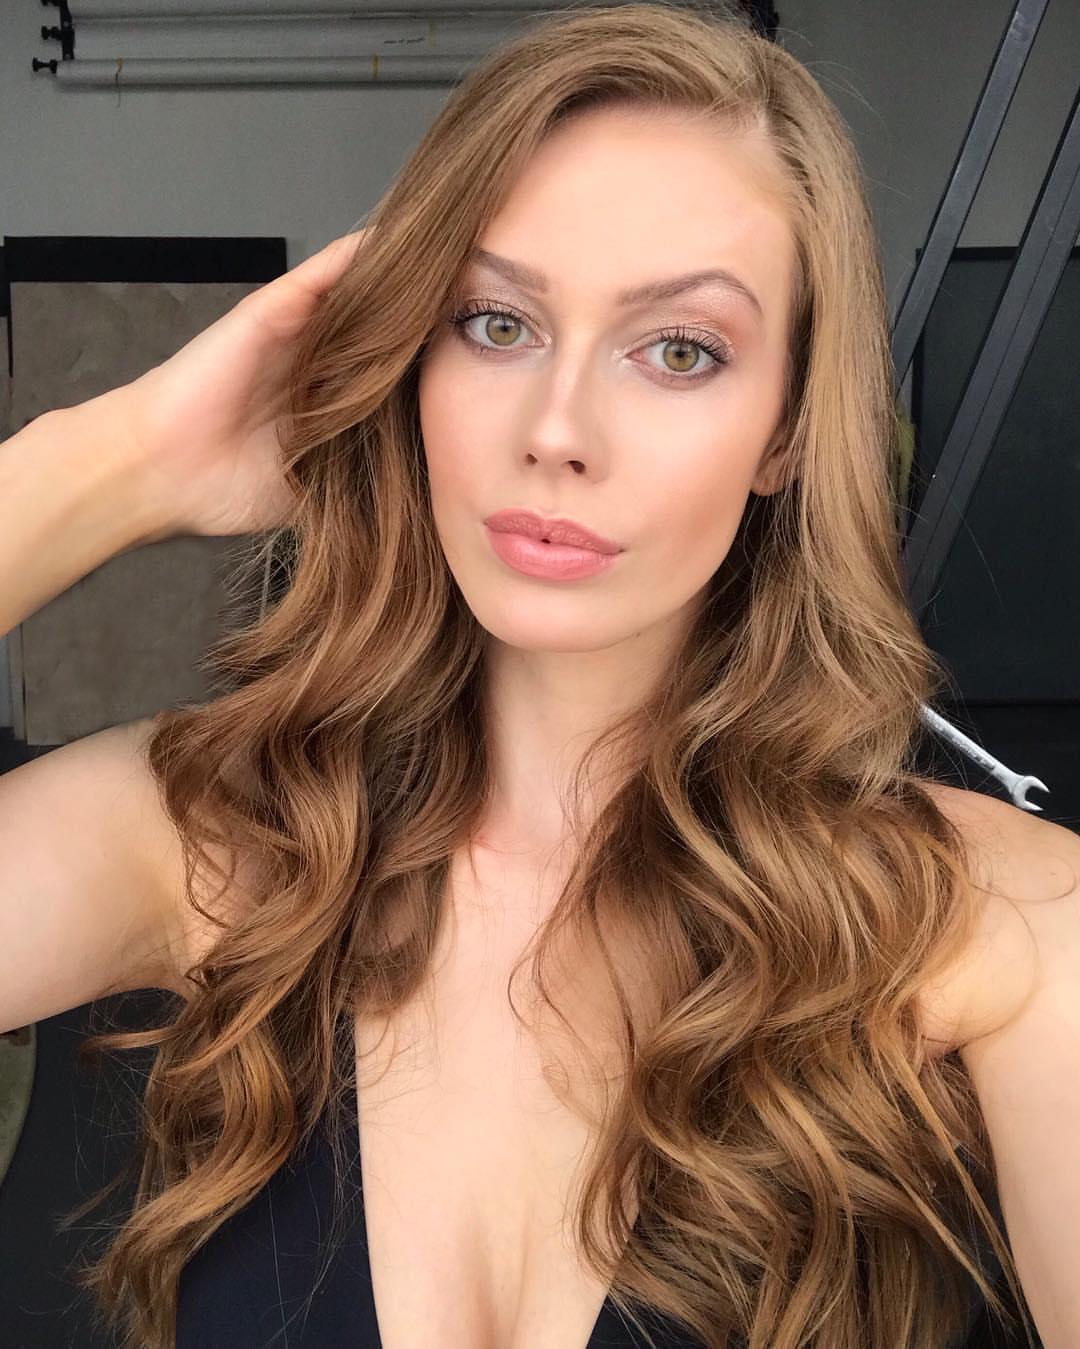 candidatas a miss slovensko 2019. final: 27 de abril. - Página 9 1GMSfR